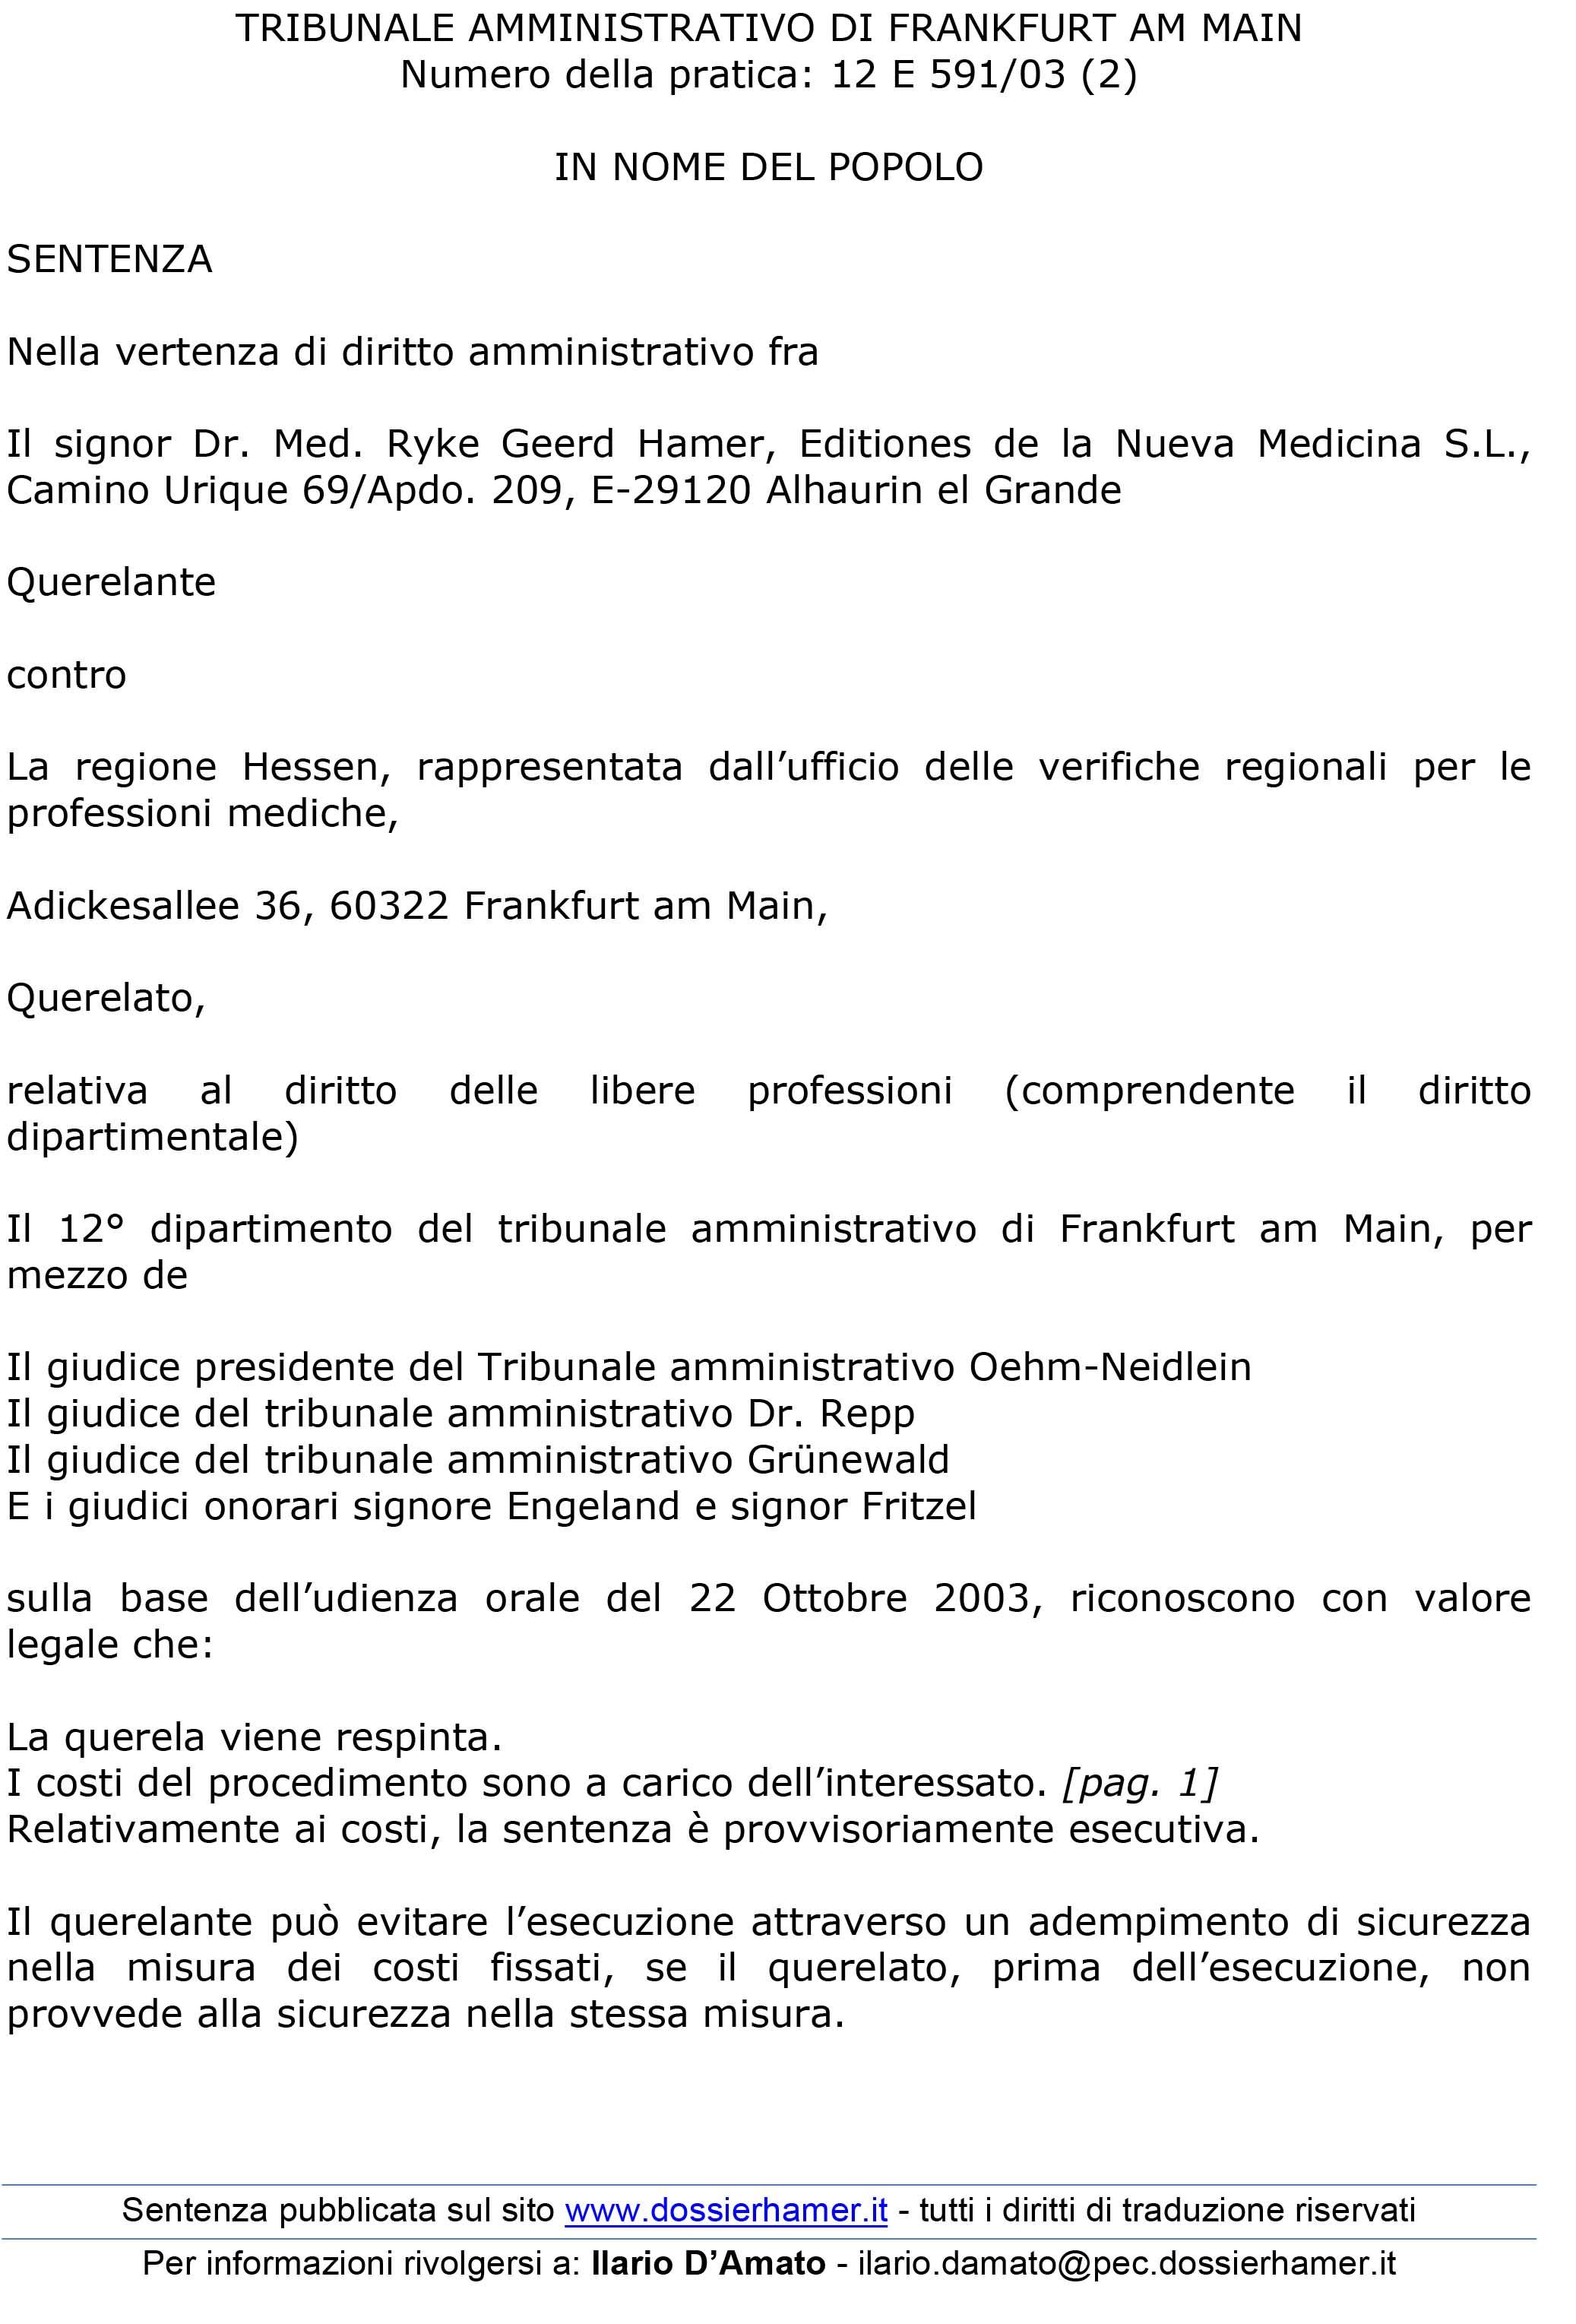 Microsoft Word - Hamer 4.doc